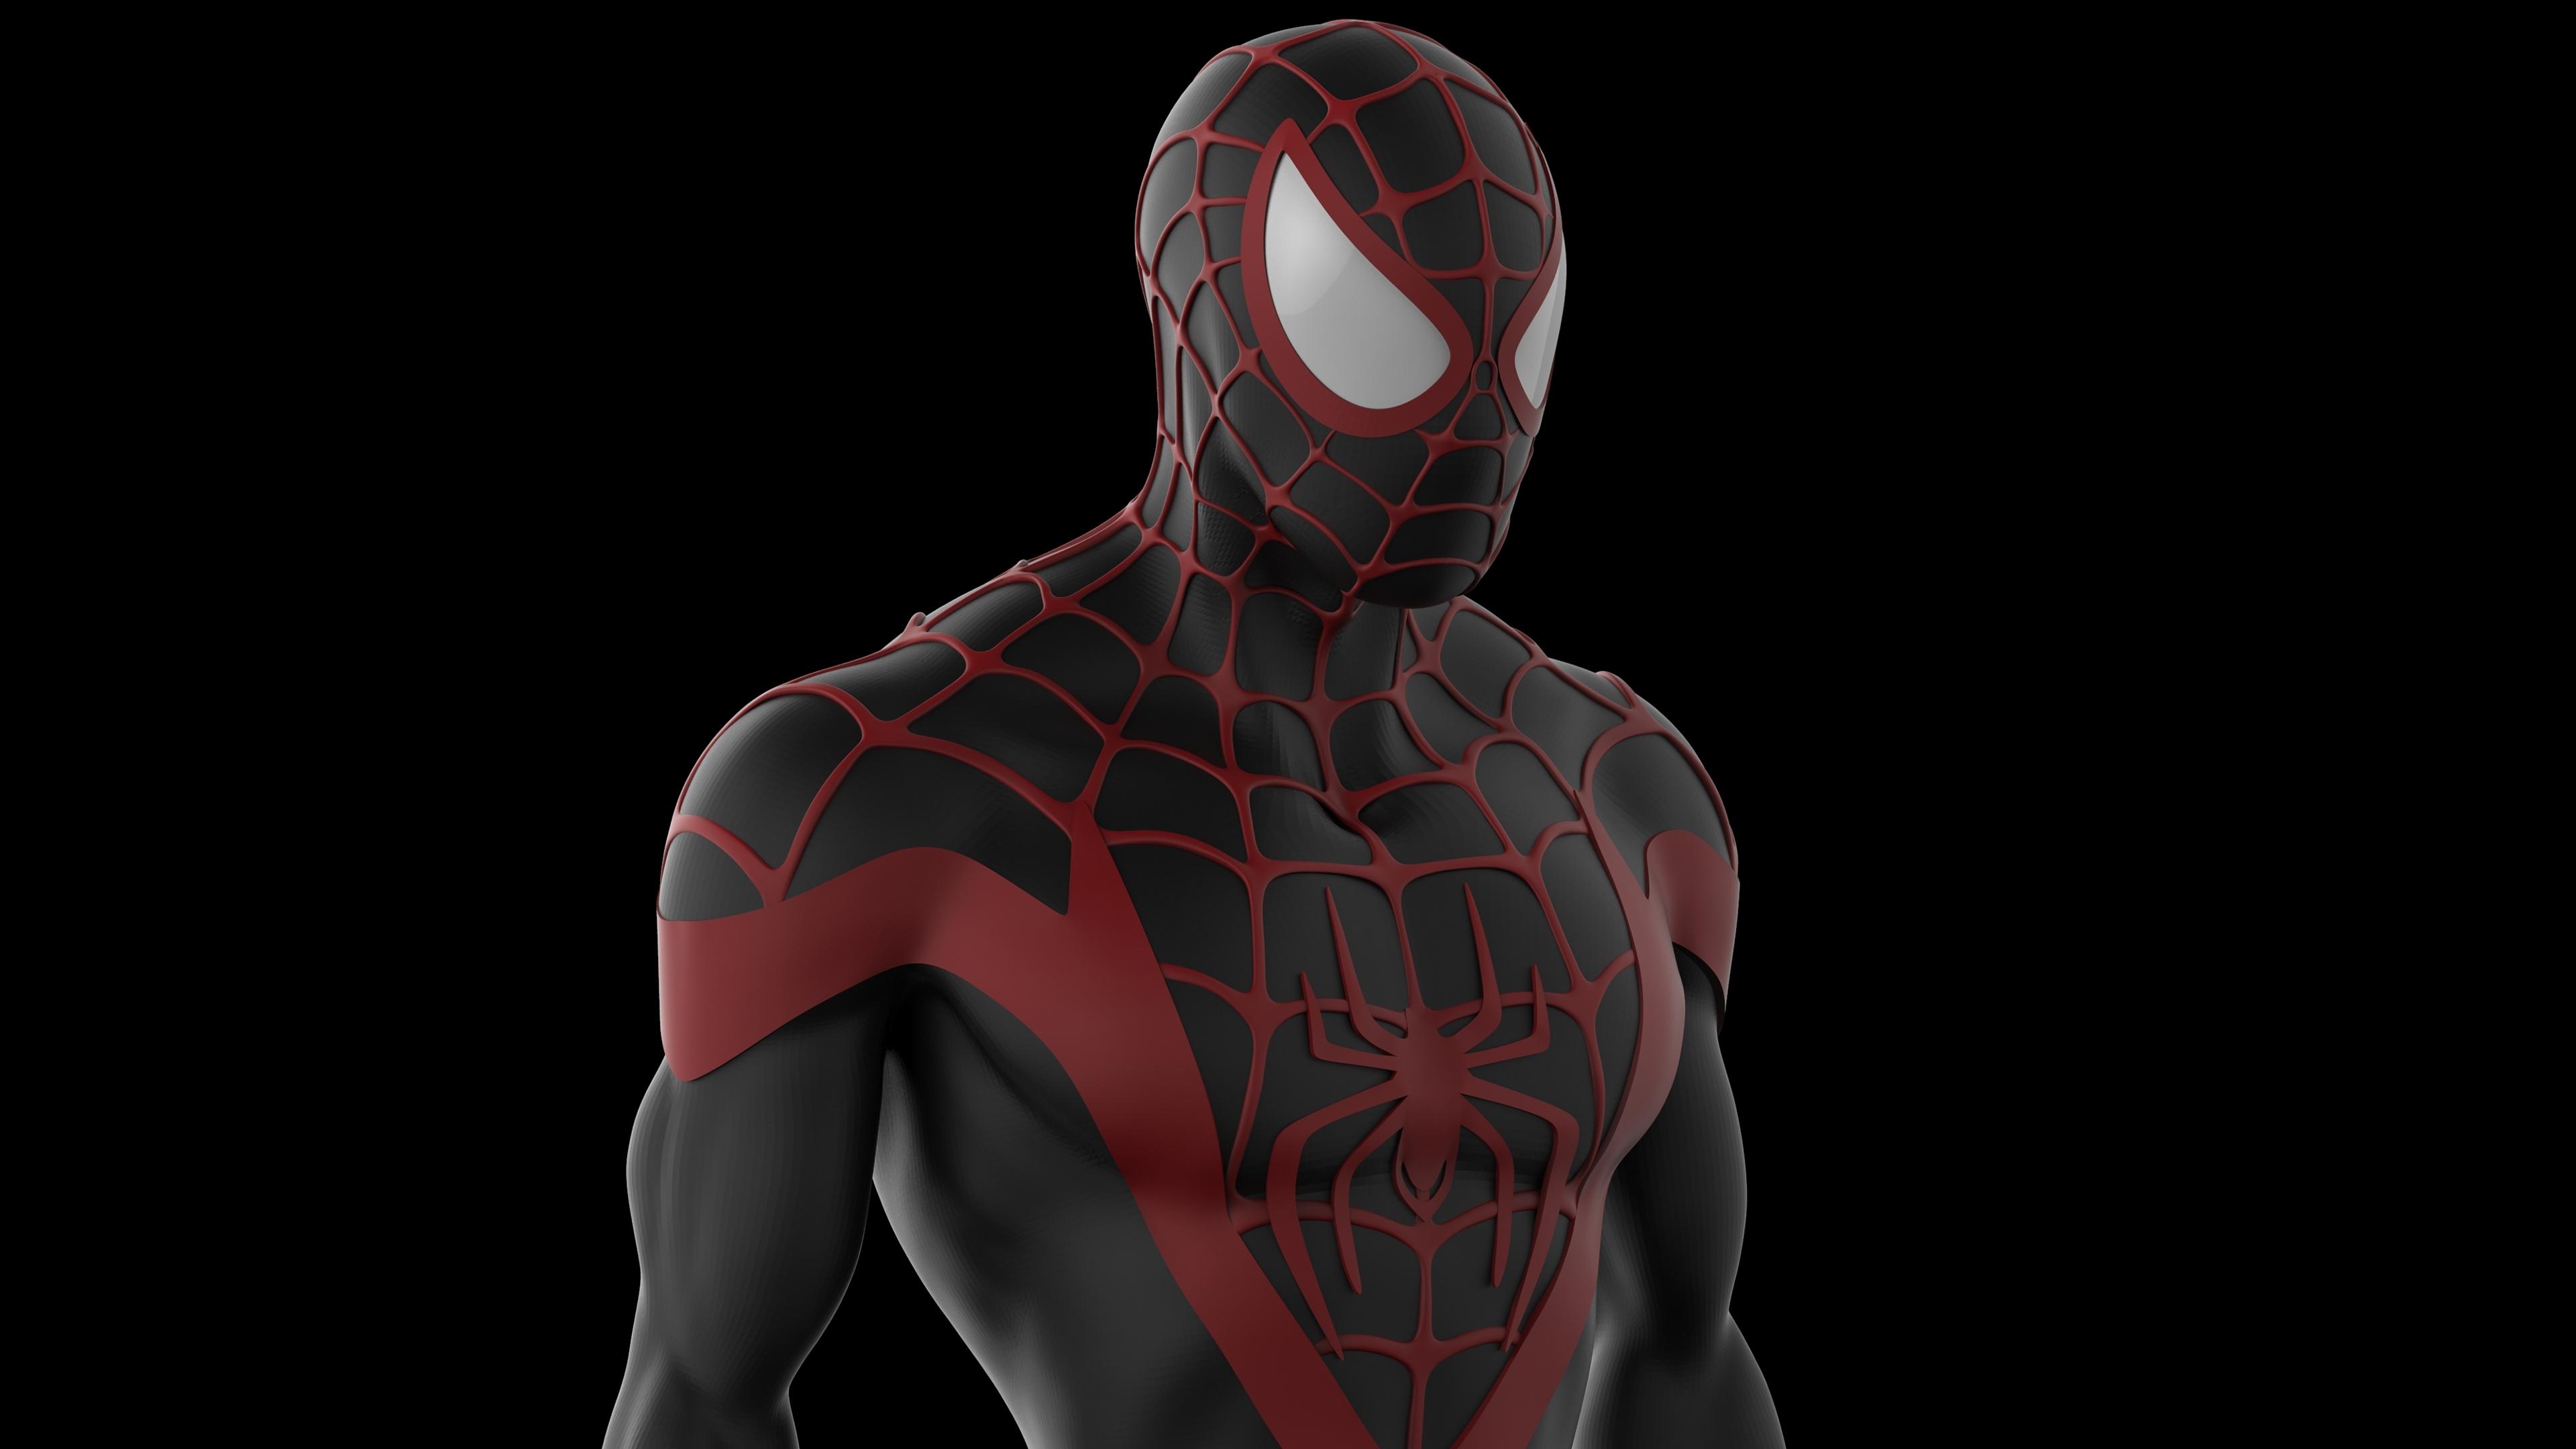 Wallpaper 4k Black Spiderman 4k Artwork 4k Wallpapers